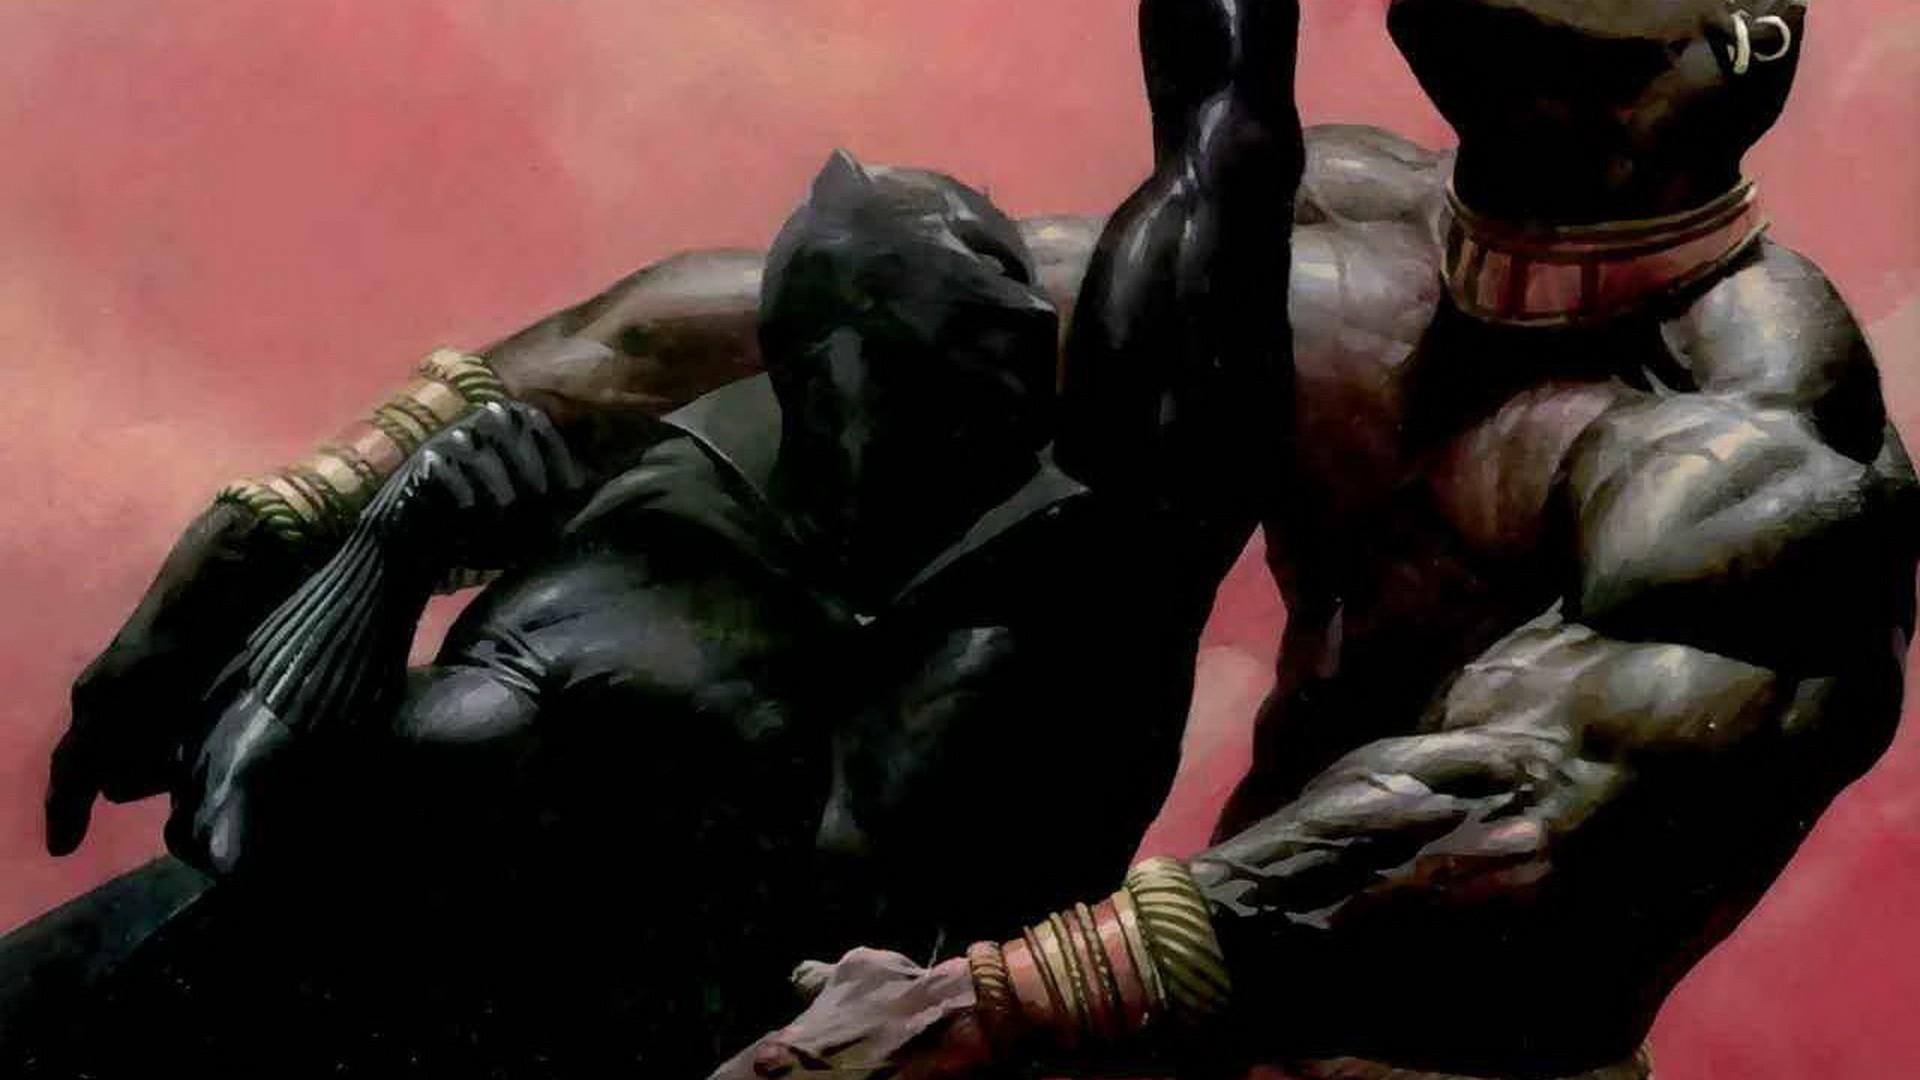 Comics   Black Panther Black Panther Wallpaper 1920x1080